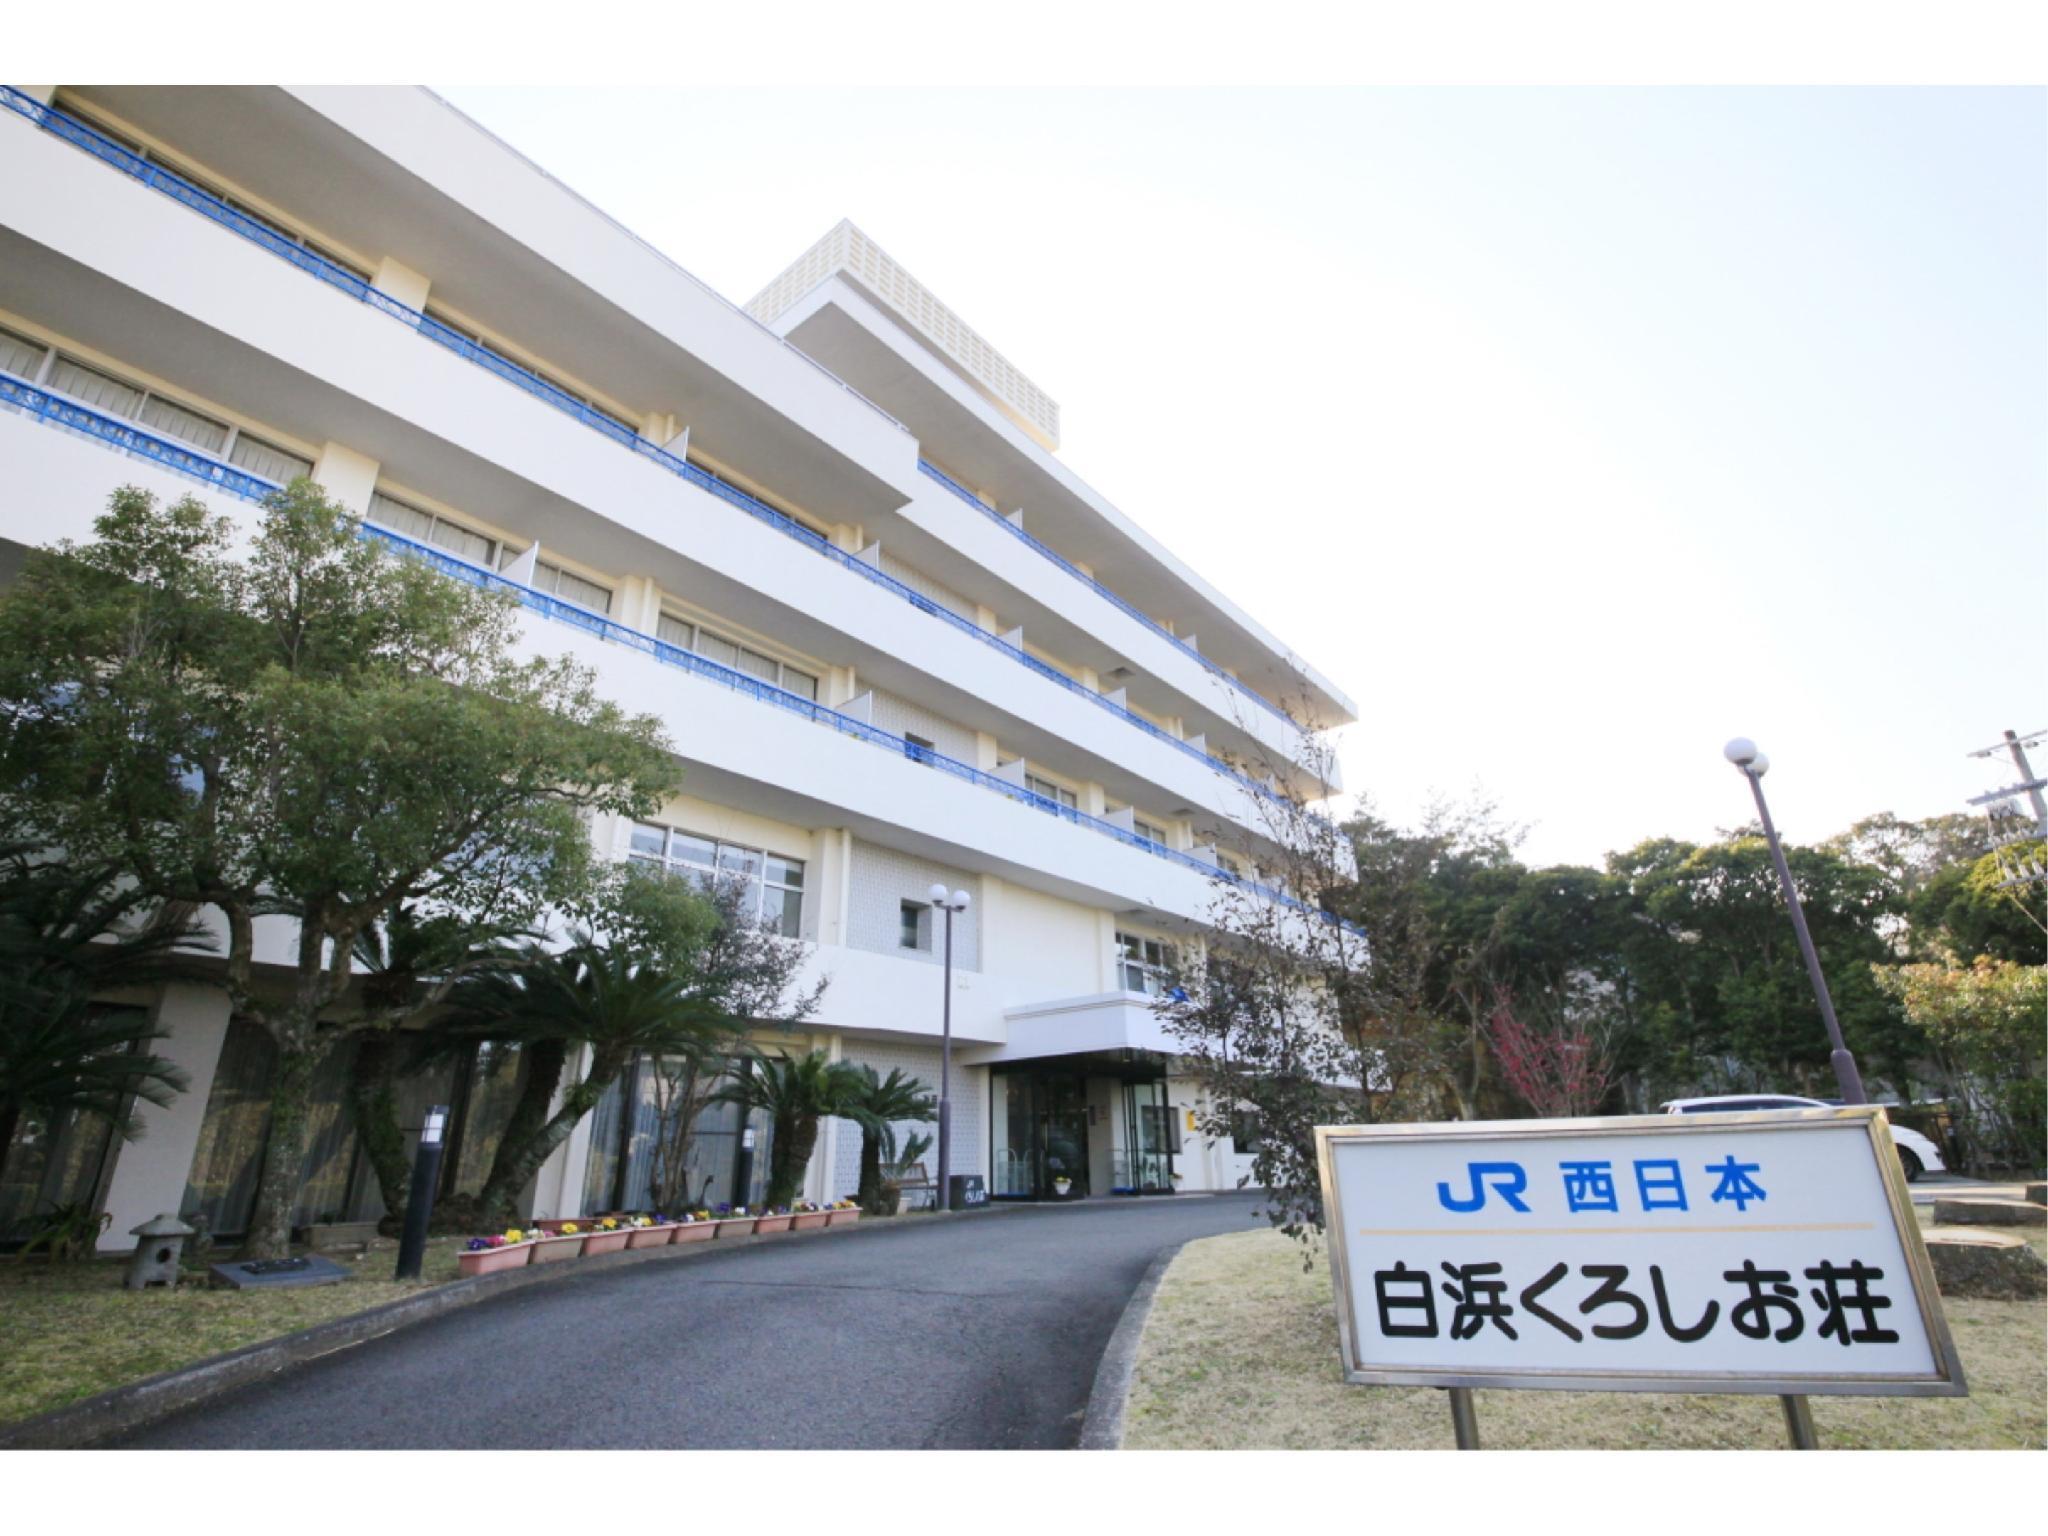 JR Kuroshioso